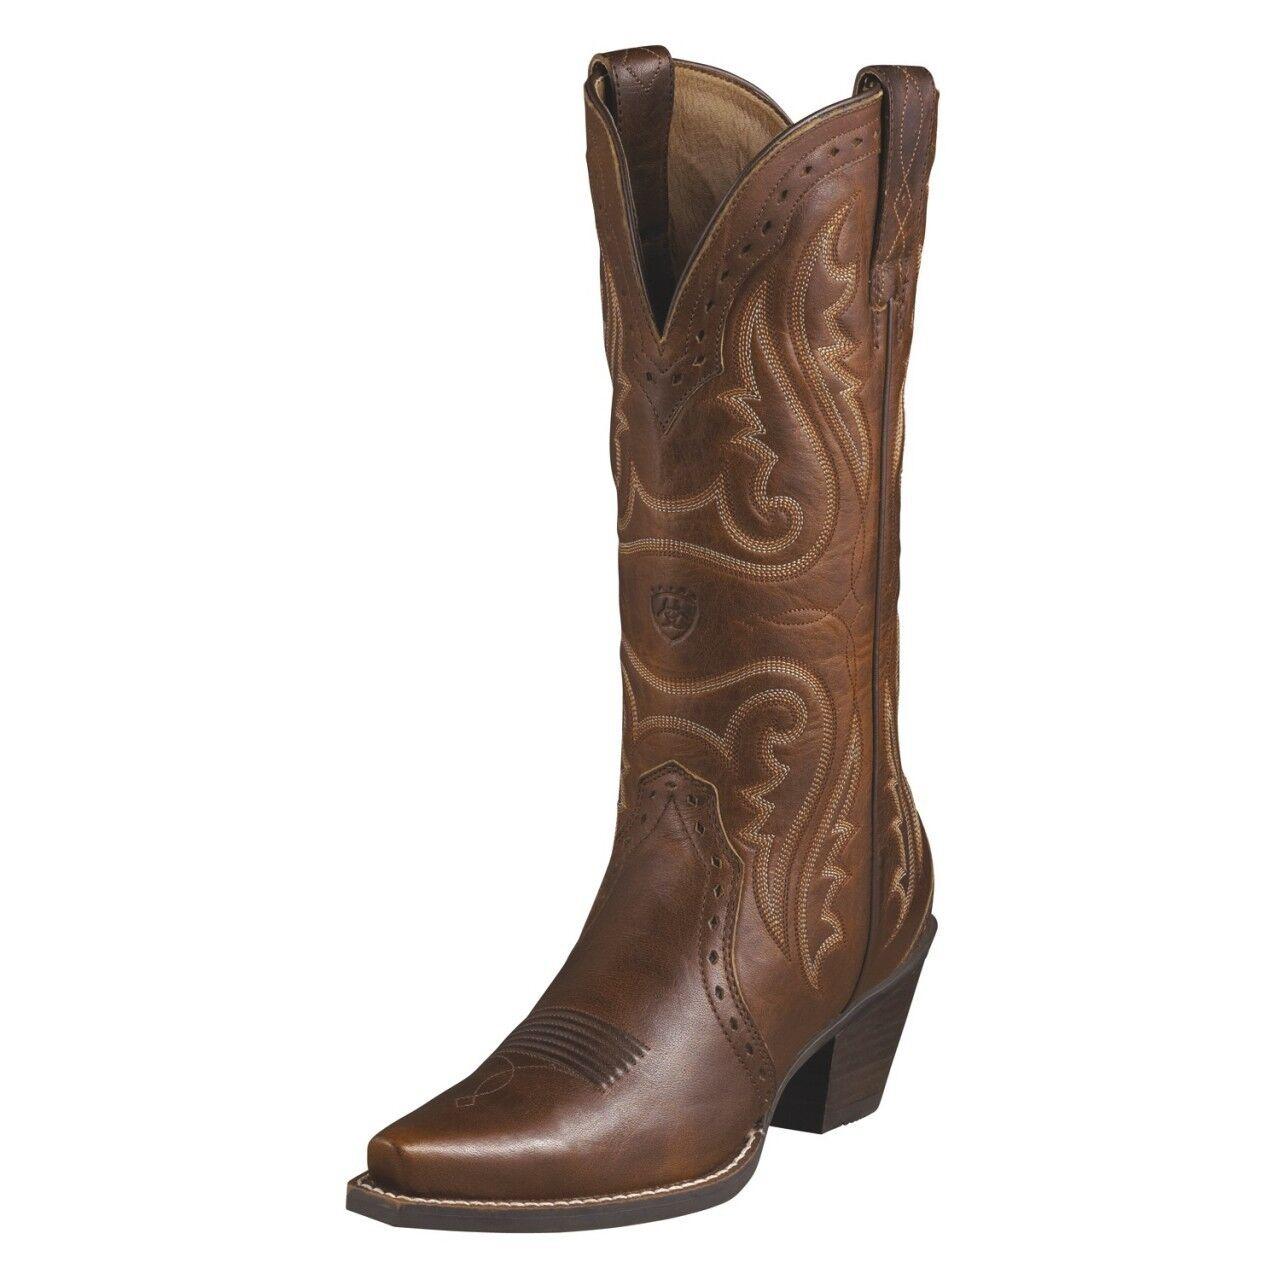 Ariat Women's Heritage Vintage Western Boots (10005908)